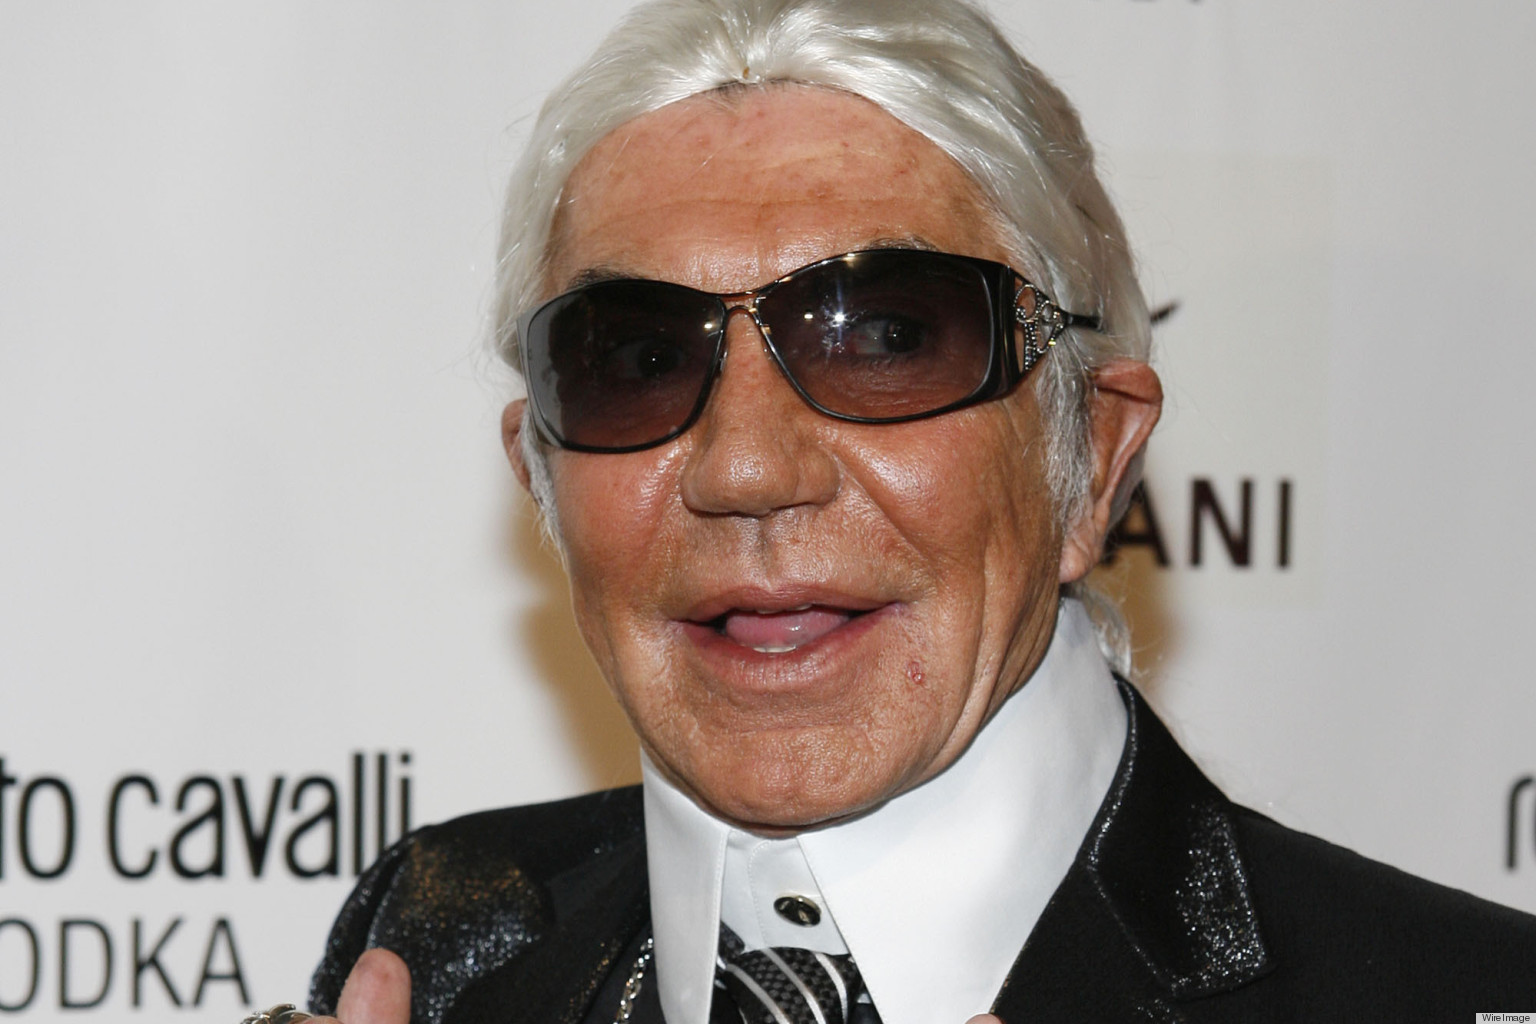 Roberto Cavalli: 'Karl Lagerfeld, He Looks Ridiculous ...